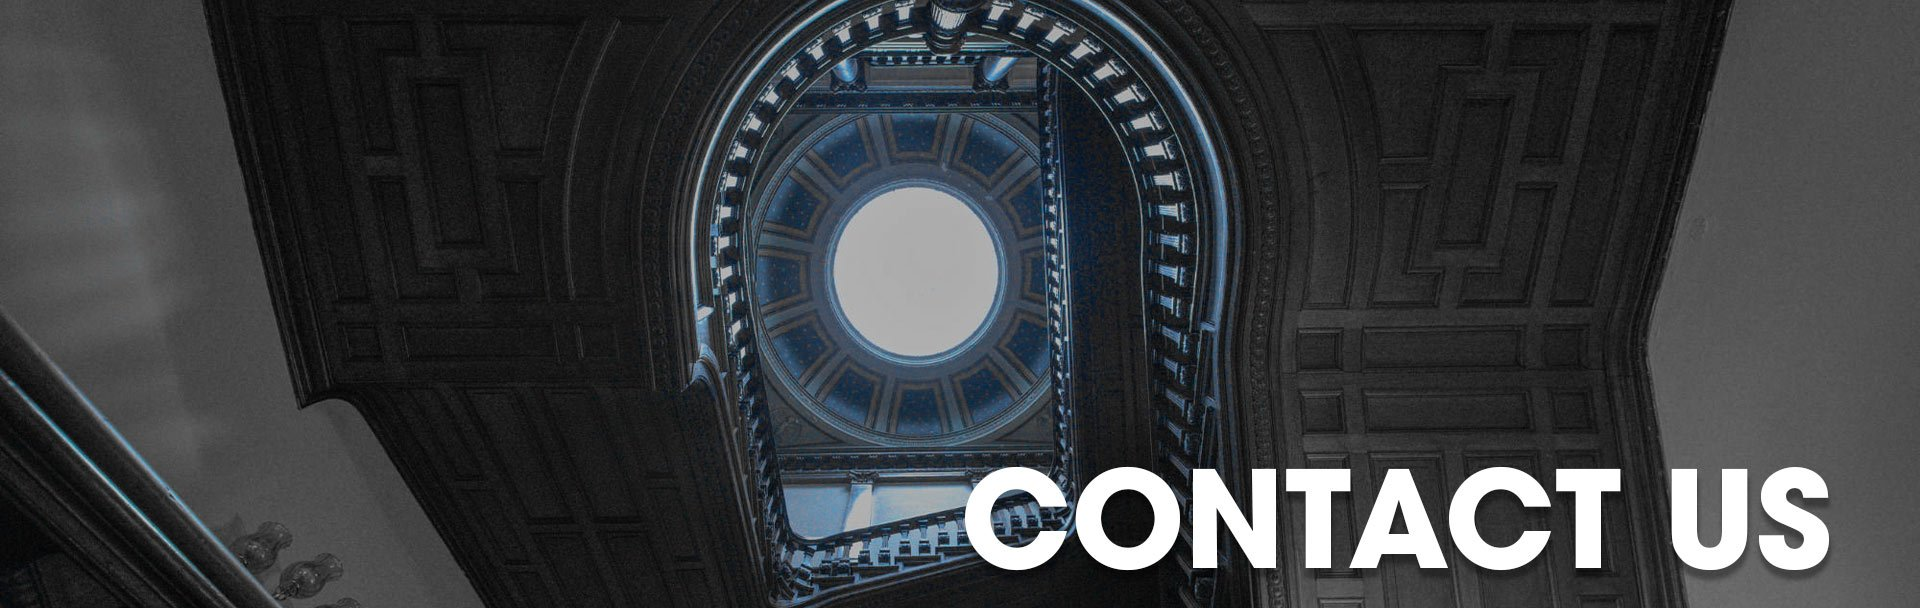 Contact Us form for the Sir Arthur Conan Doyle Centre in Edinburgh